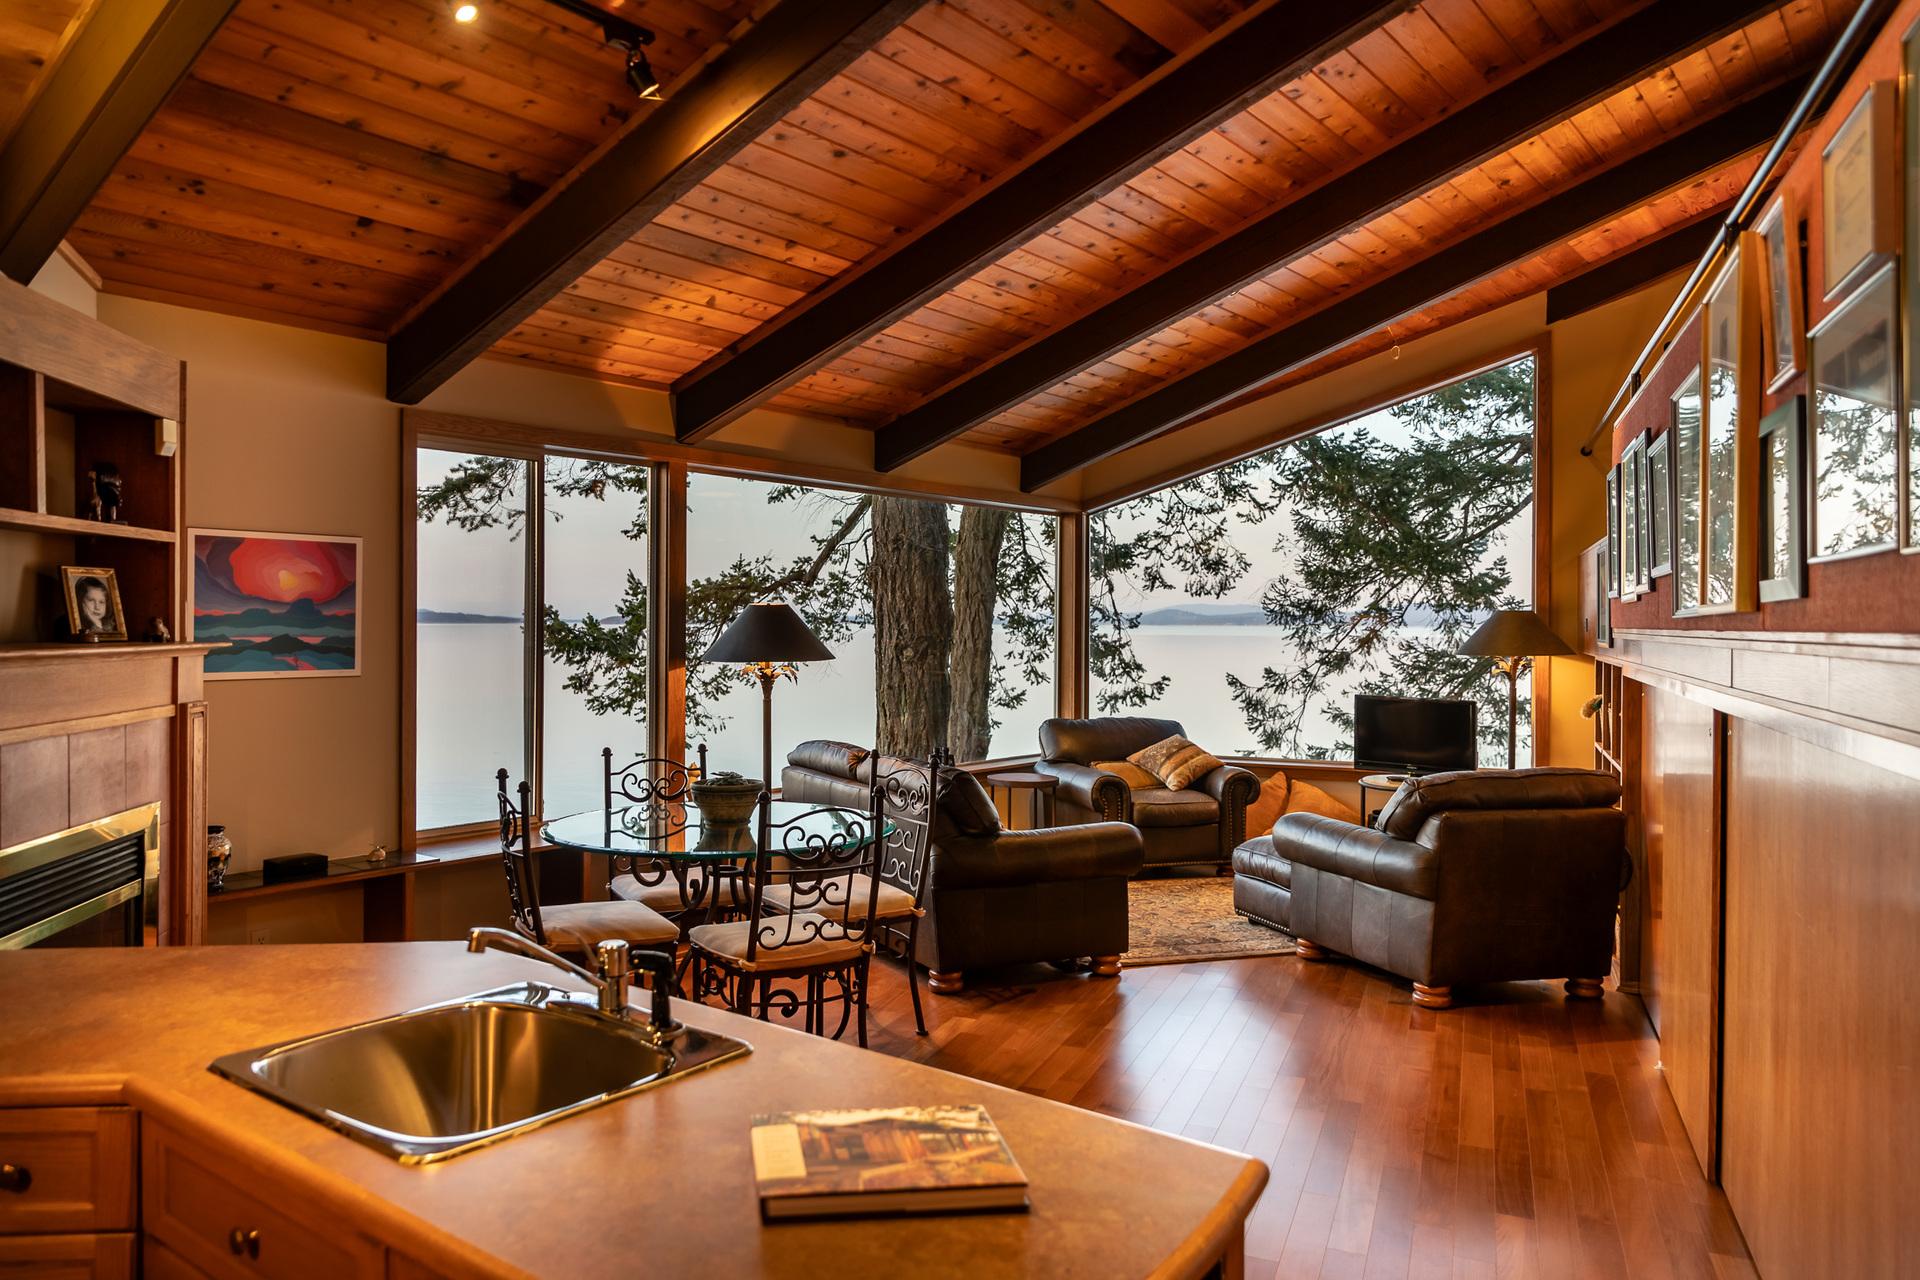 Hank Schubert Designed Guest House at 4855 Major Road, Cordova Bay, Saanich East